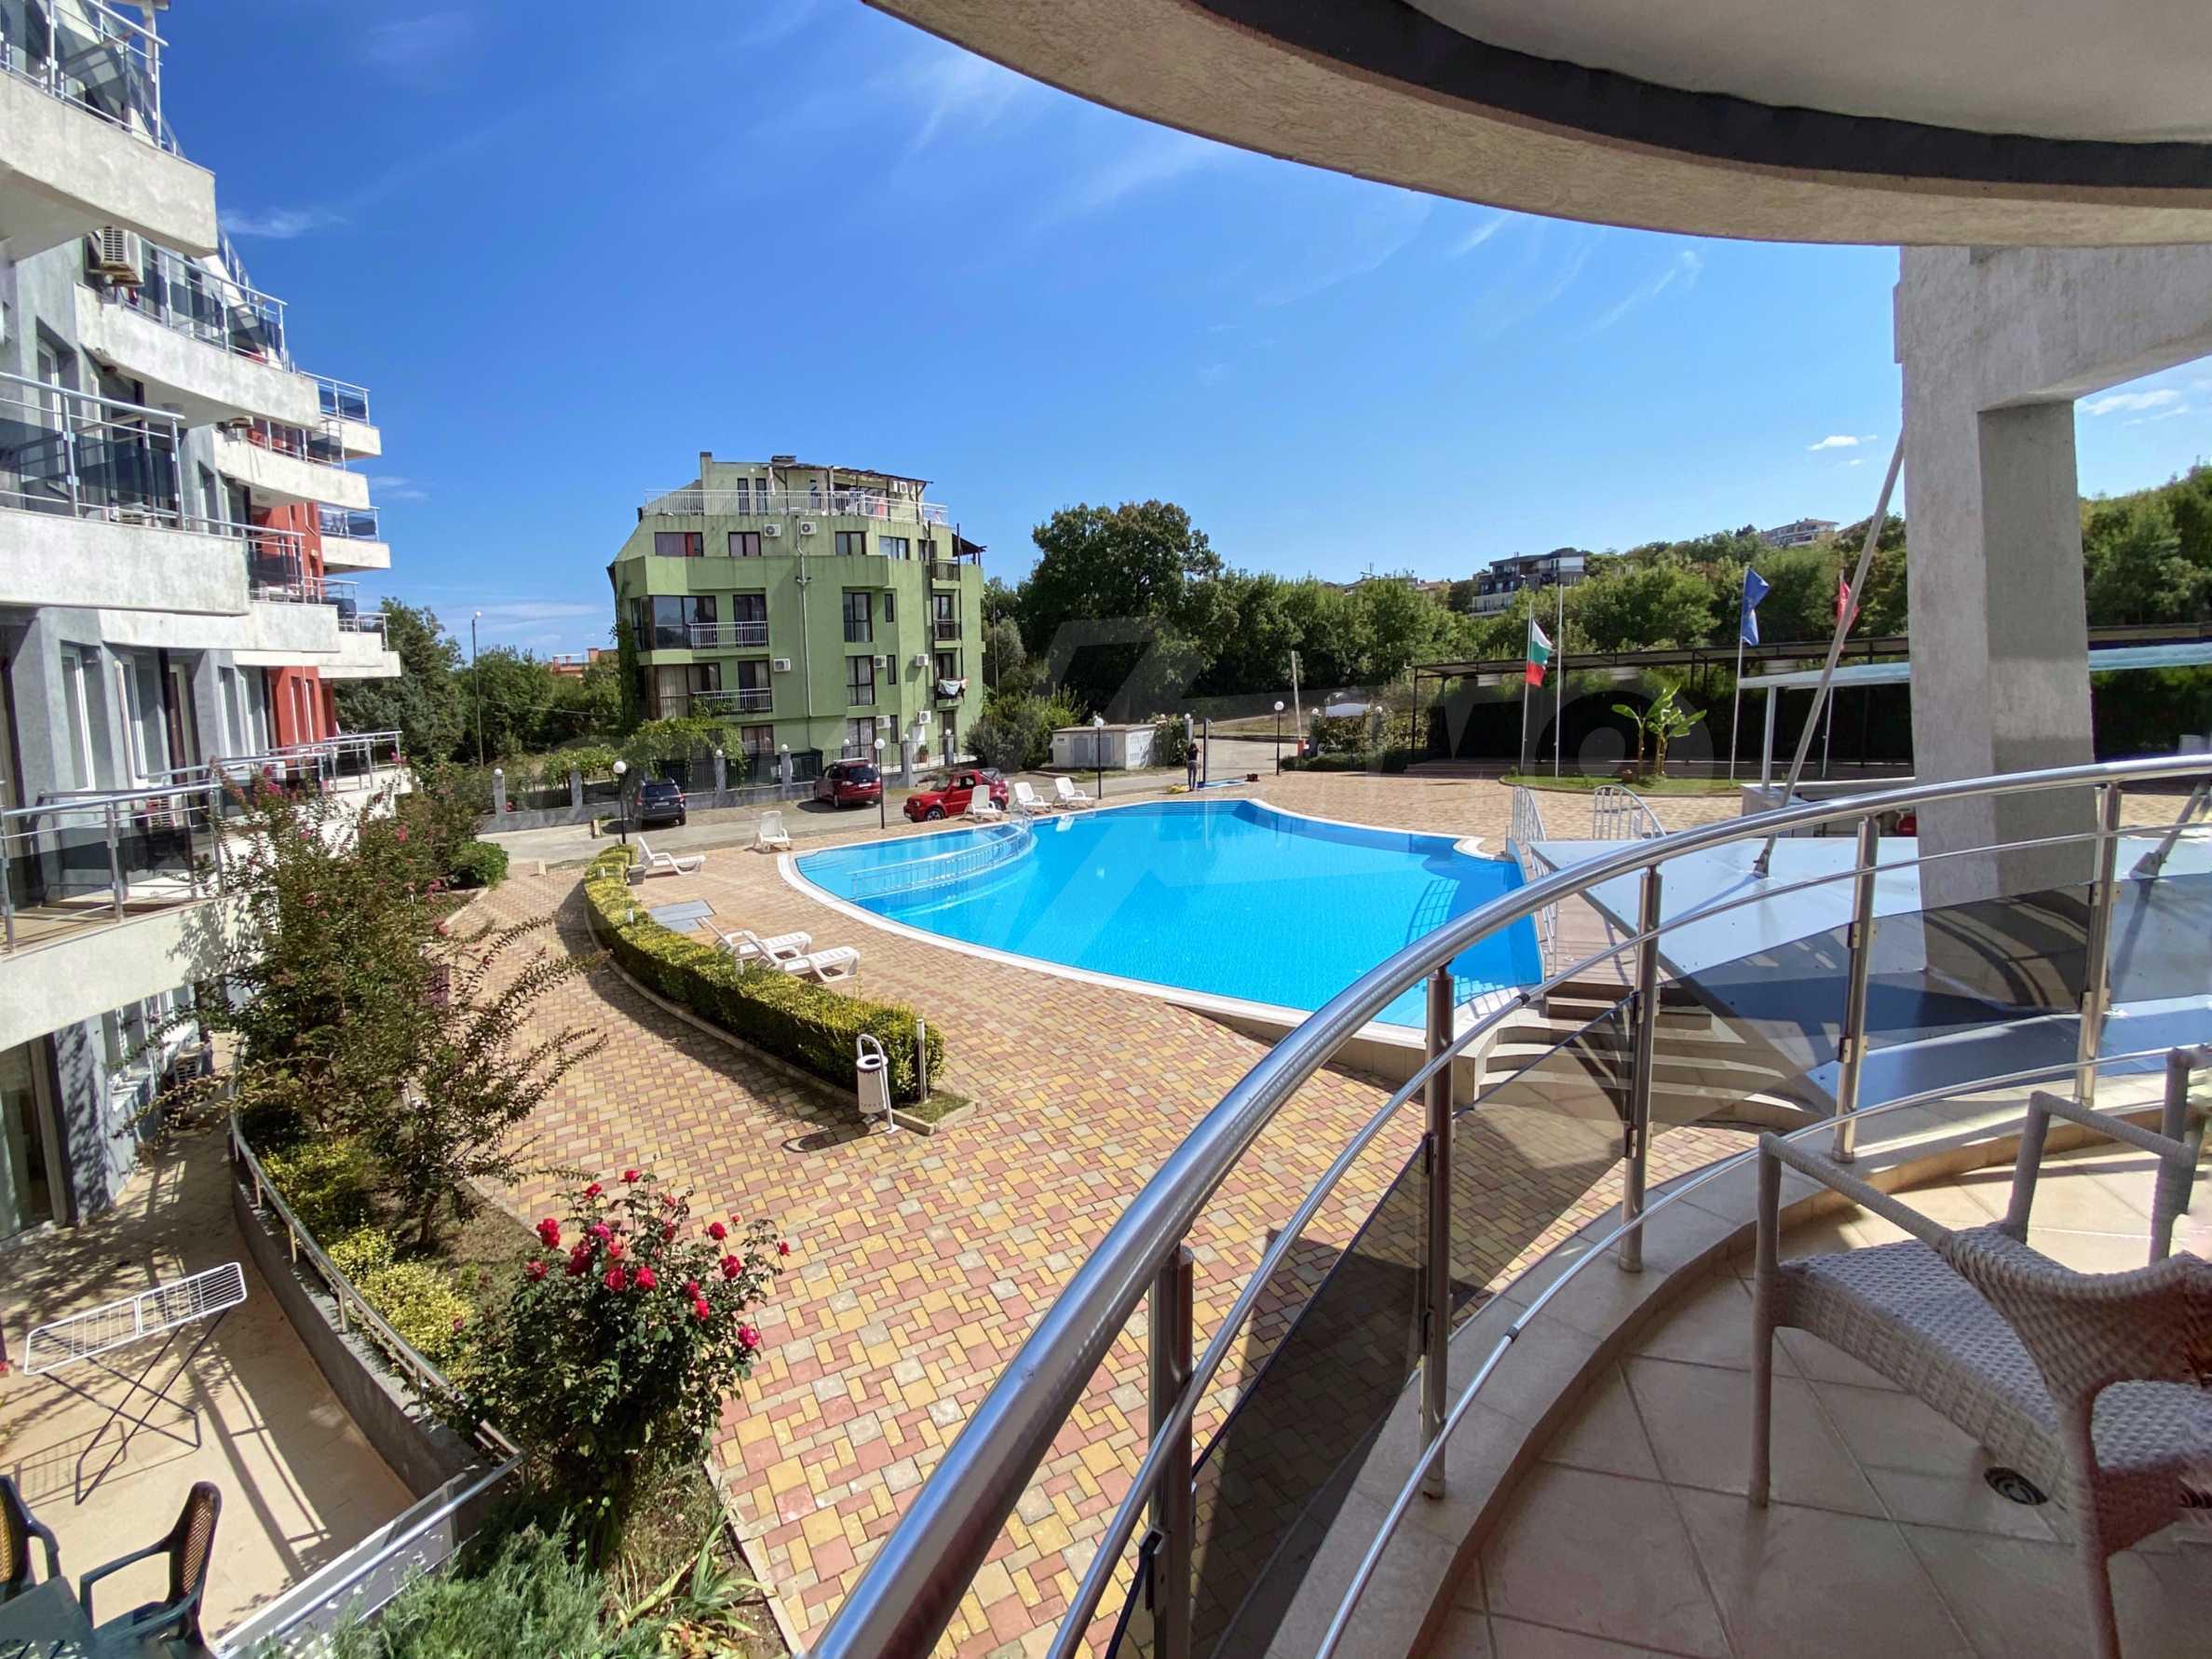 Тристаен апартамент близо до плажа в комплекс Емберли в Лозенец (ап. №201) 4